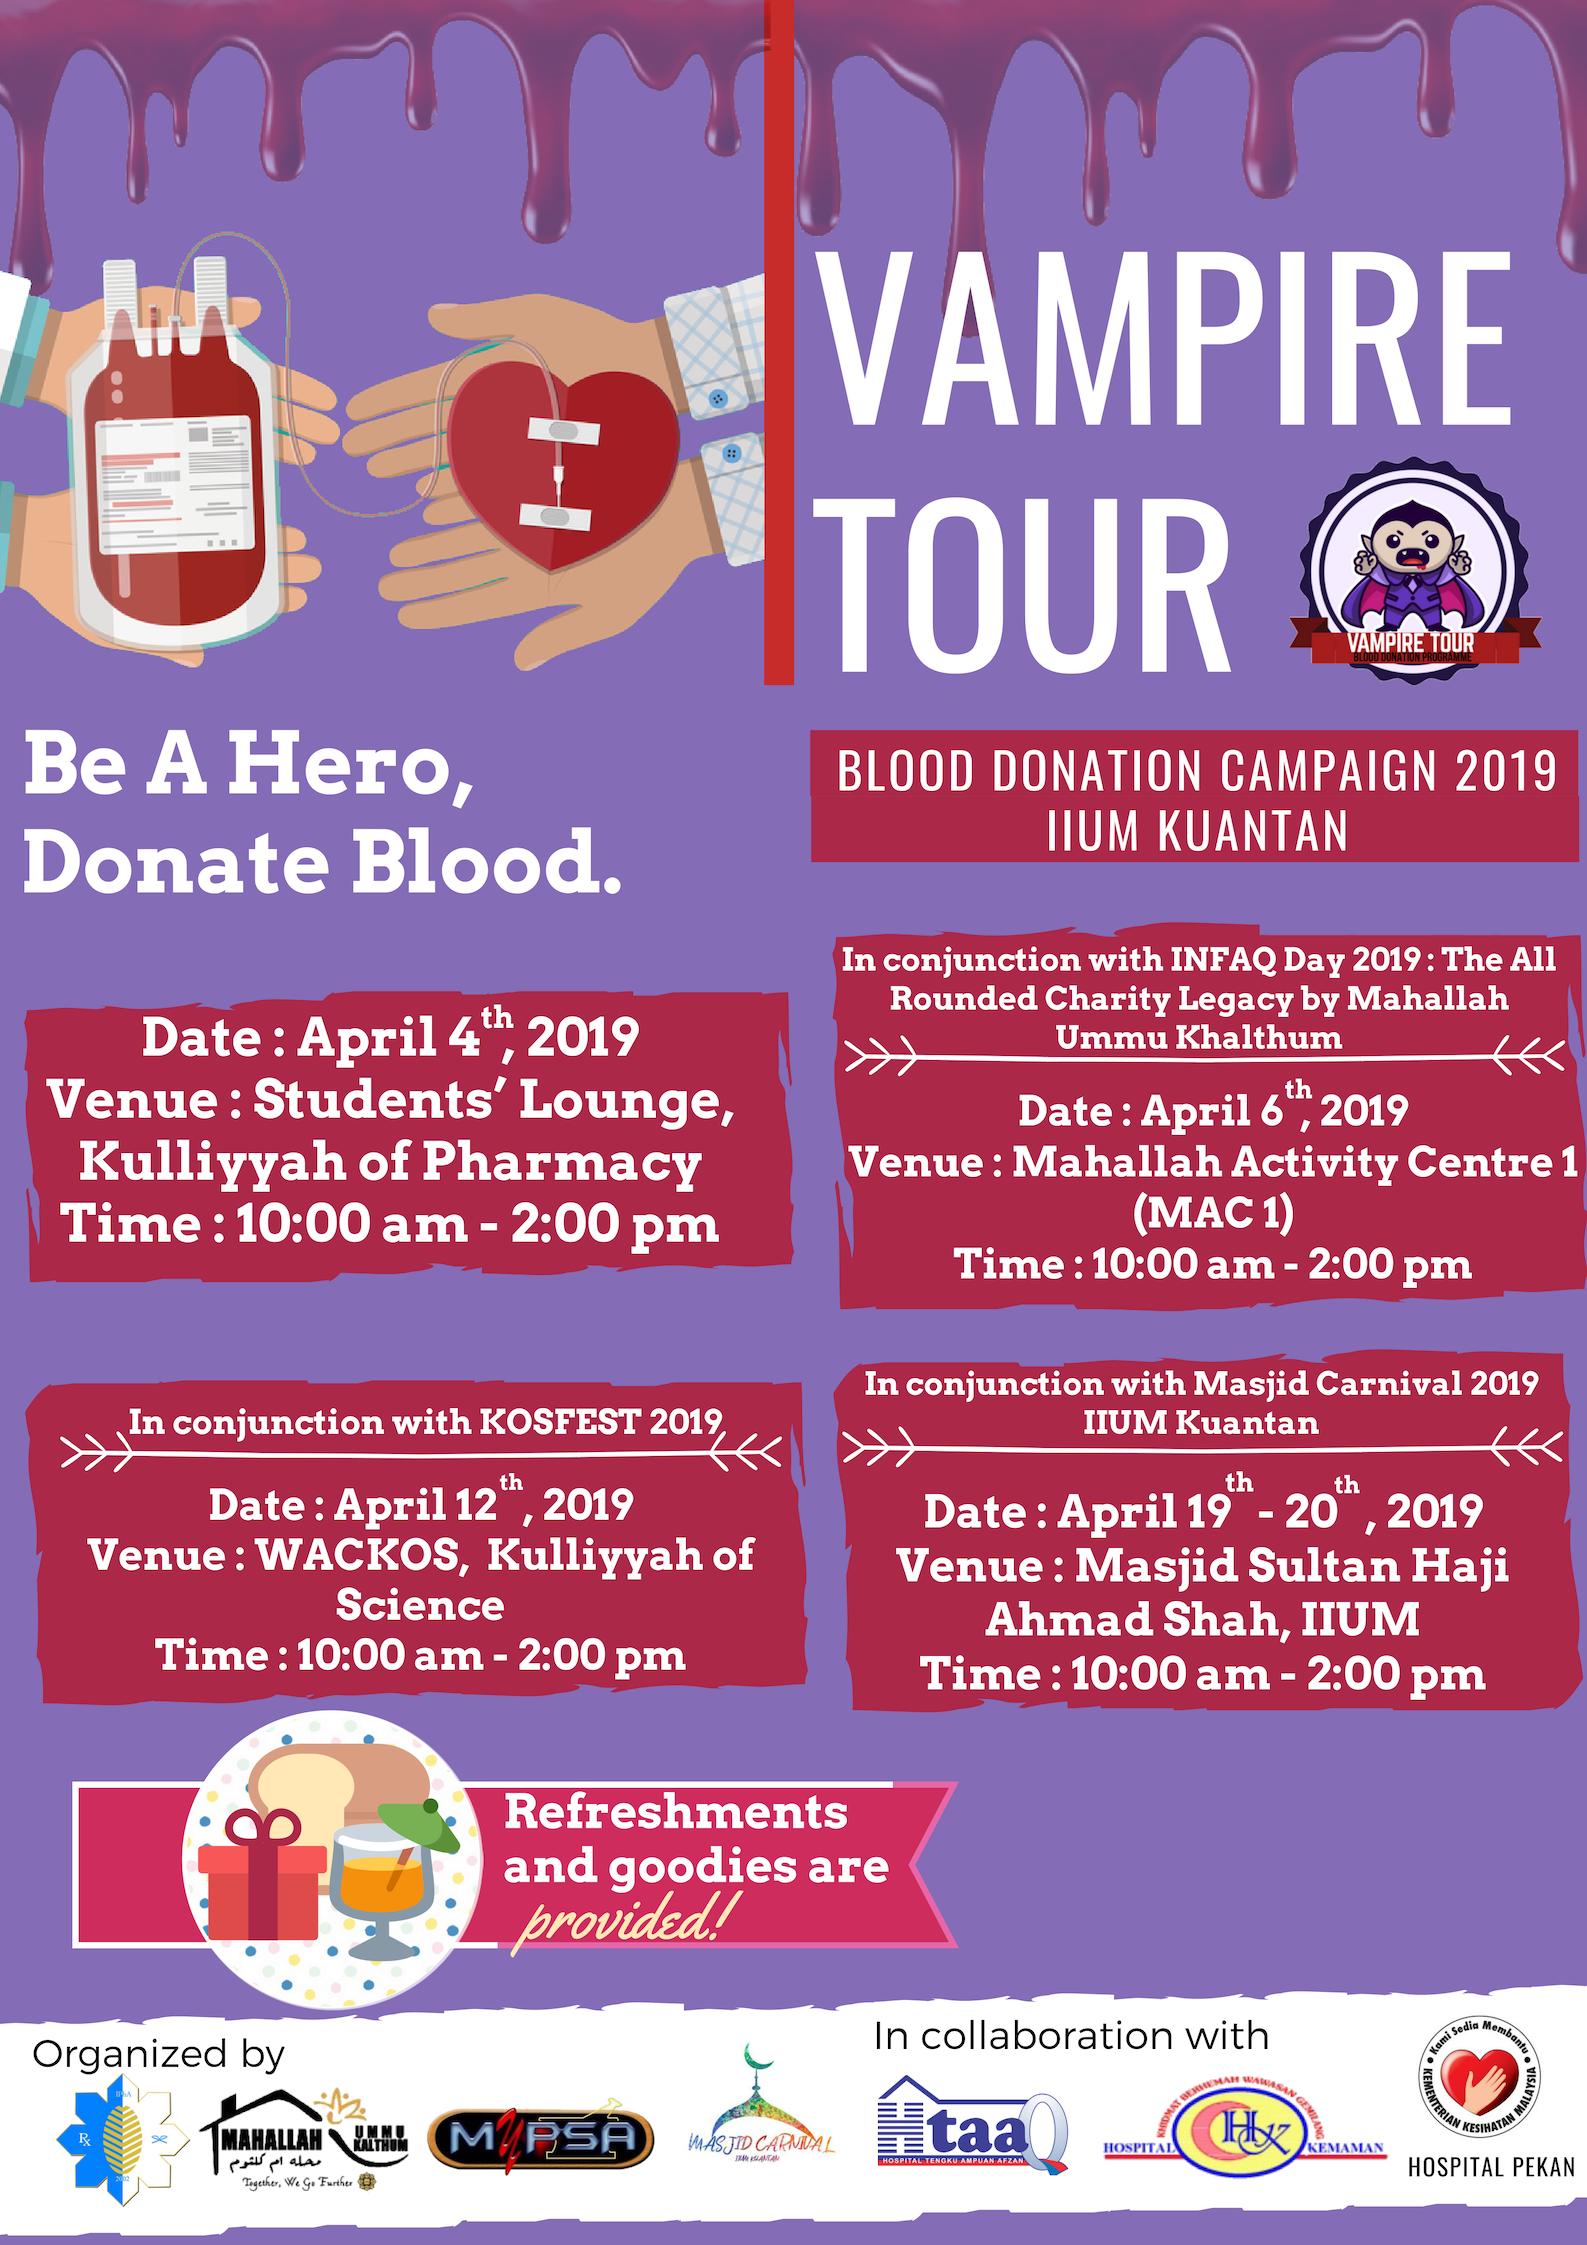 Vampire Tour: Blood Donation Programme 2019